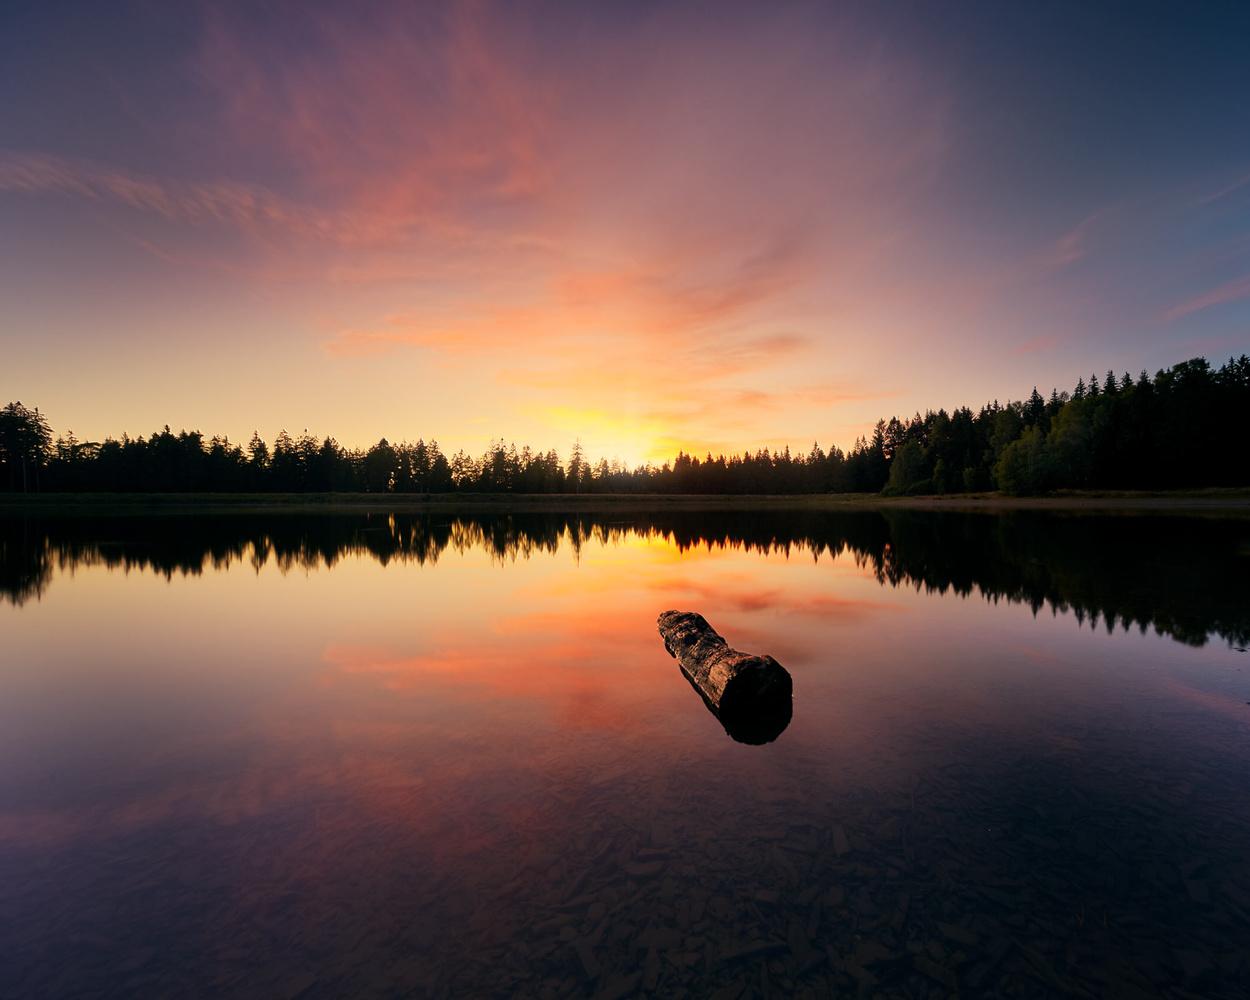 Sunset Harz by Jan Christian Zimara